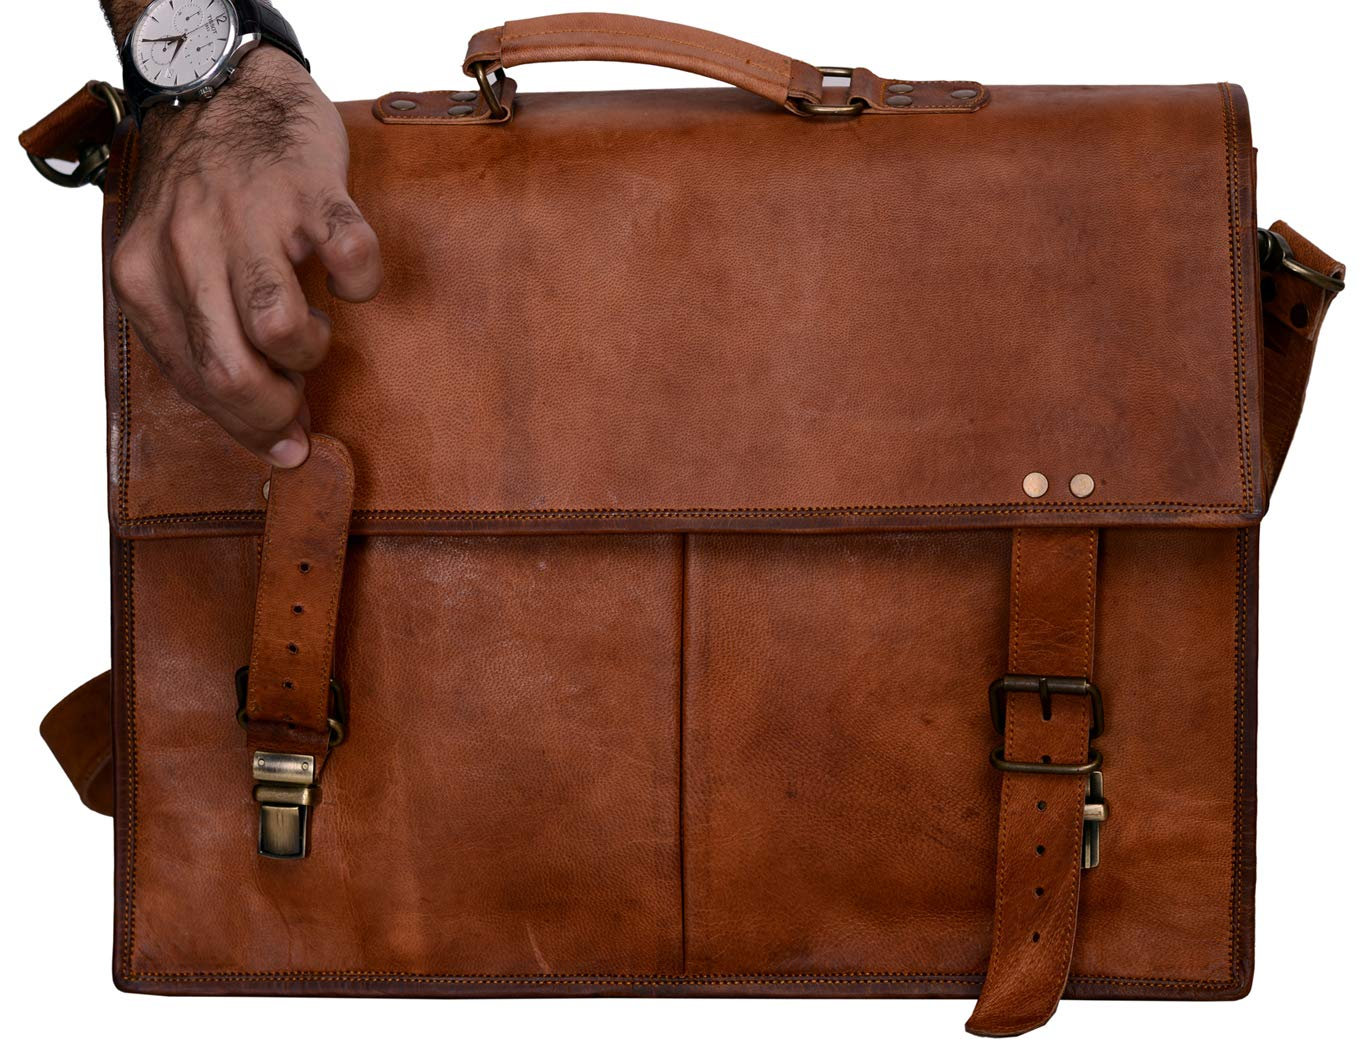 f89b1b1176 ... PL Leather Messenger Bag 16   Brown Leather Briefcase Retro Handbag  Satchel   Hip ...